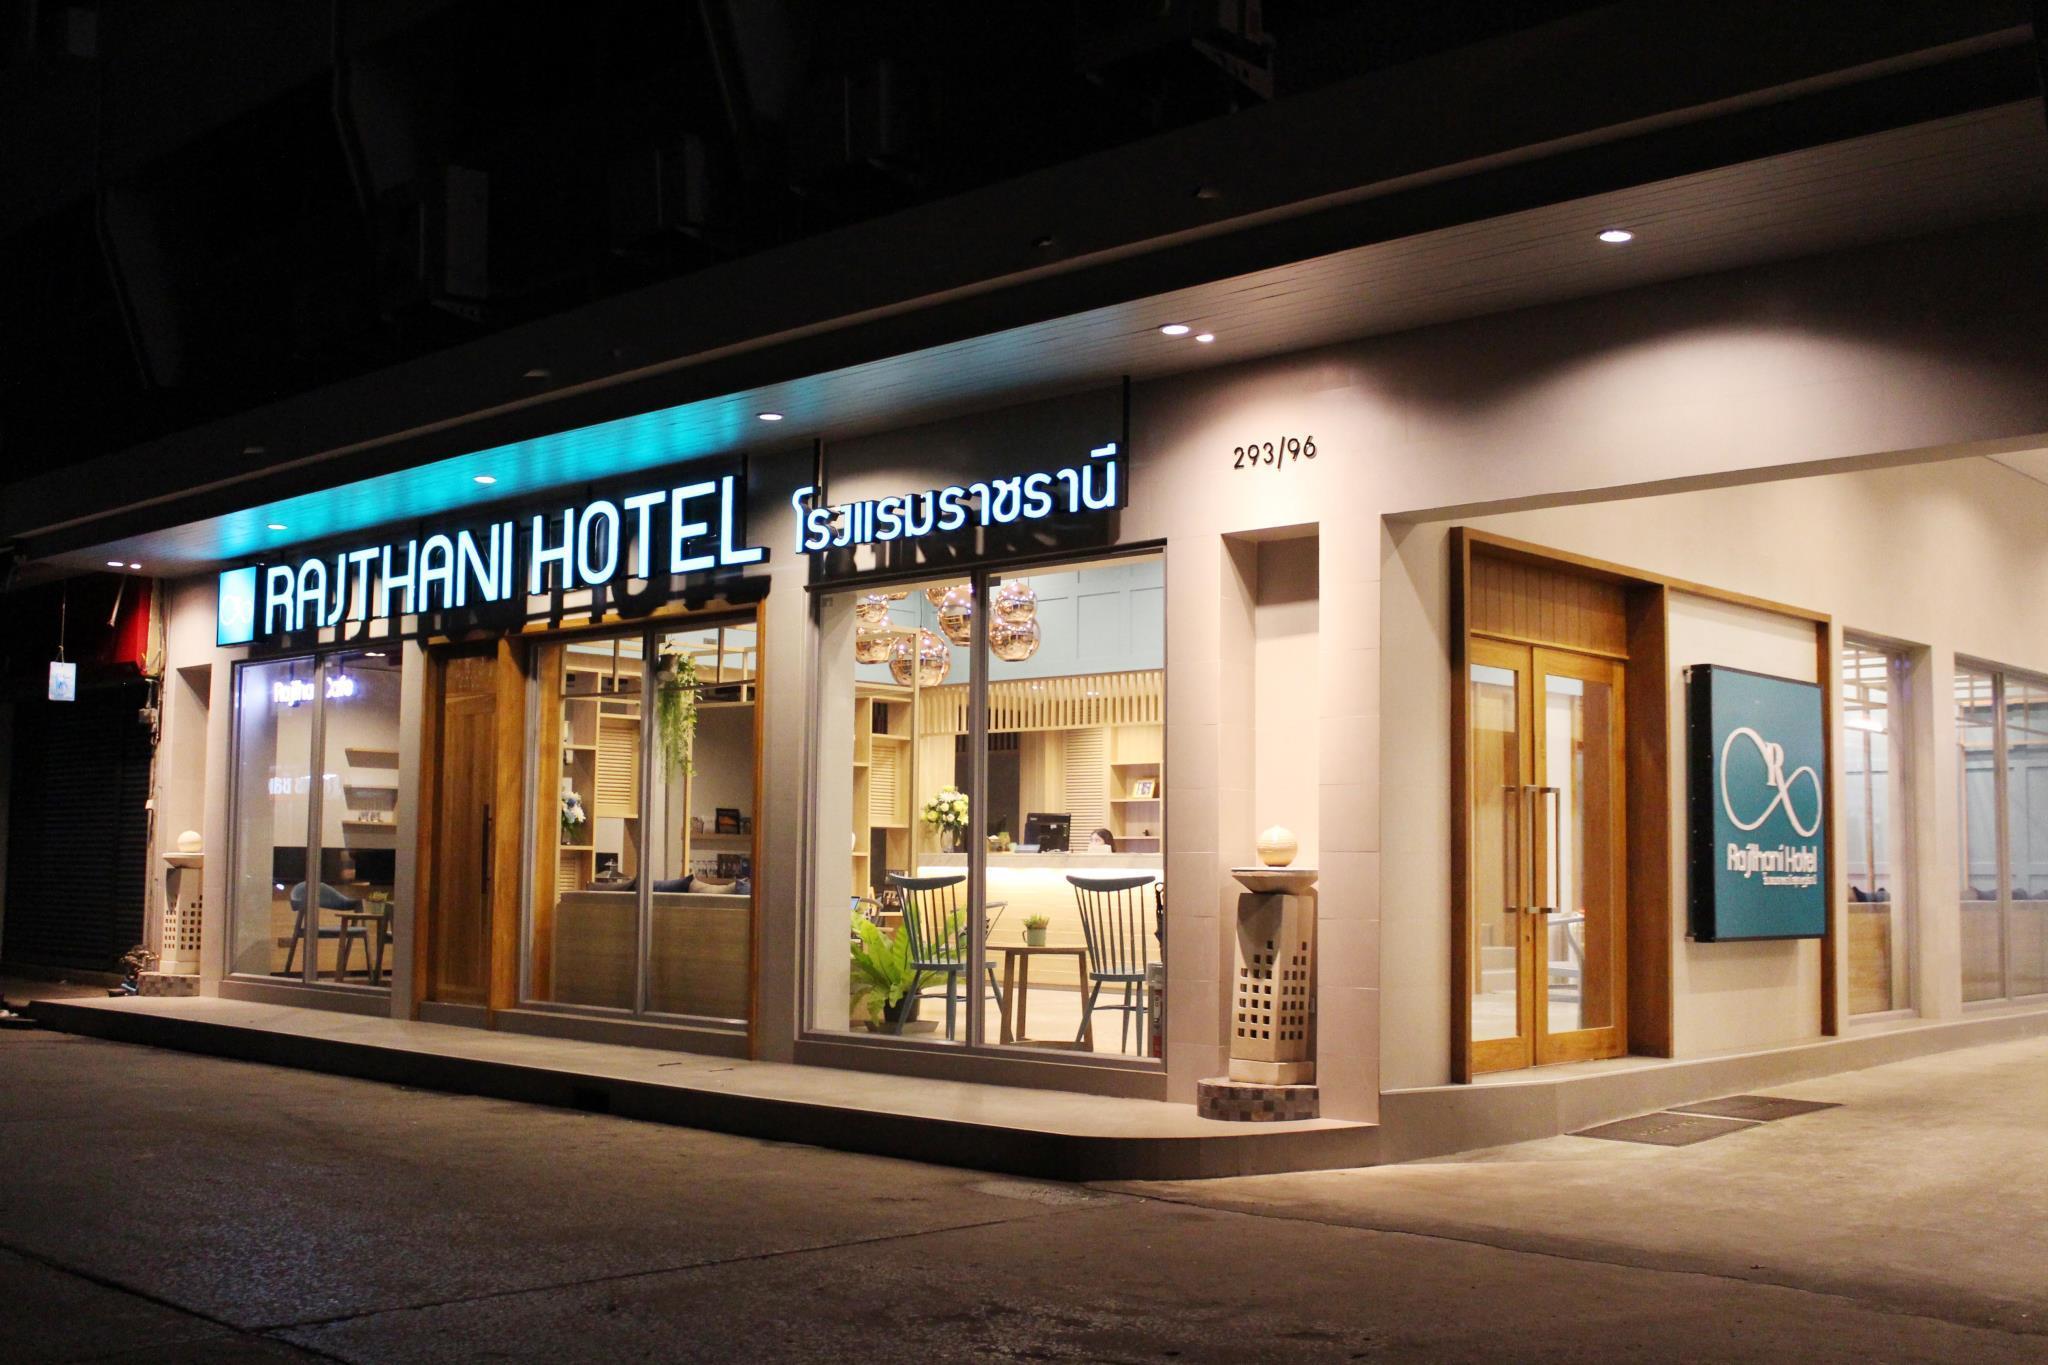 Rajthani Hotel